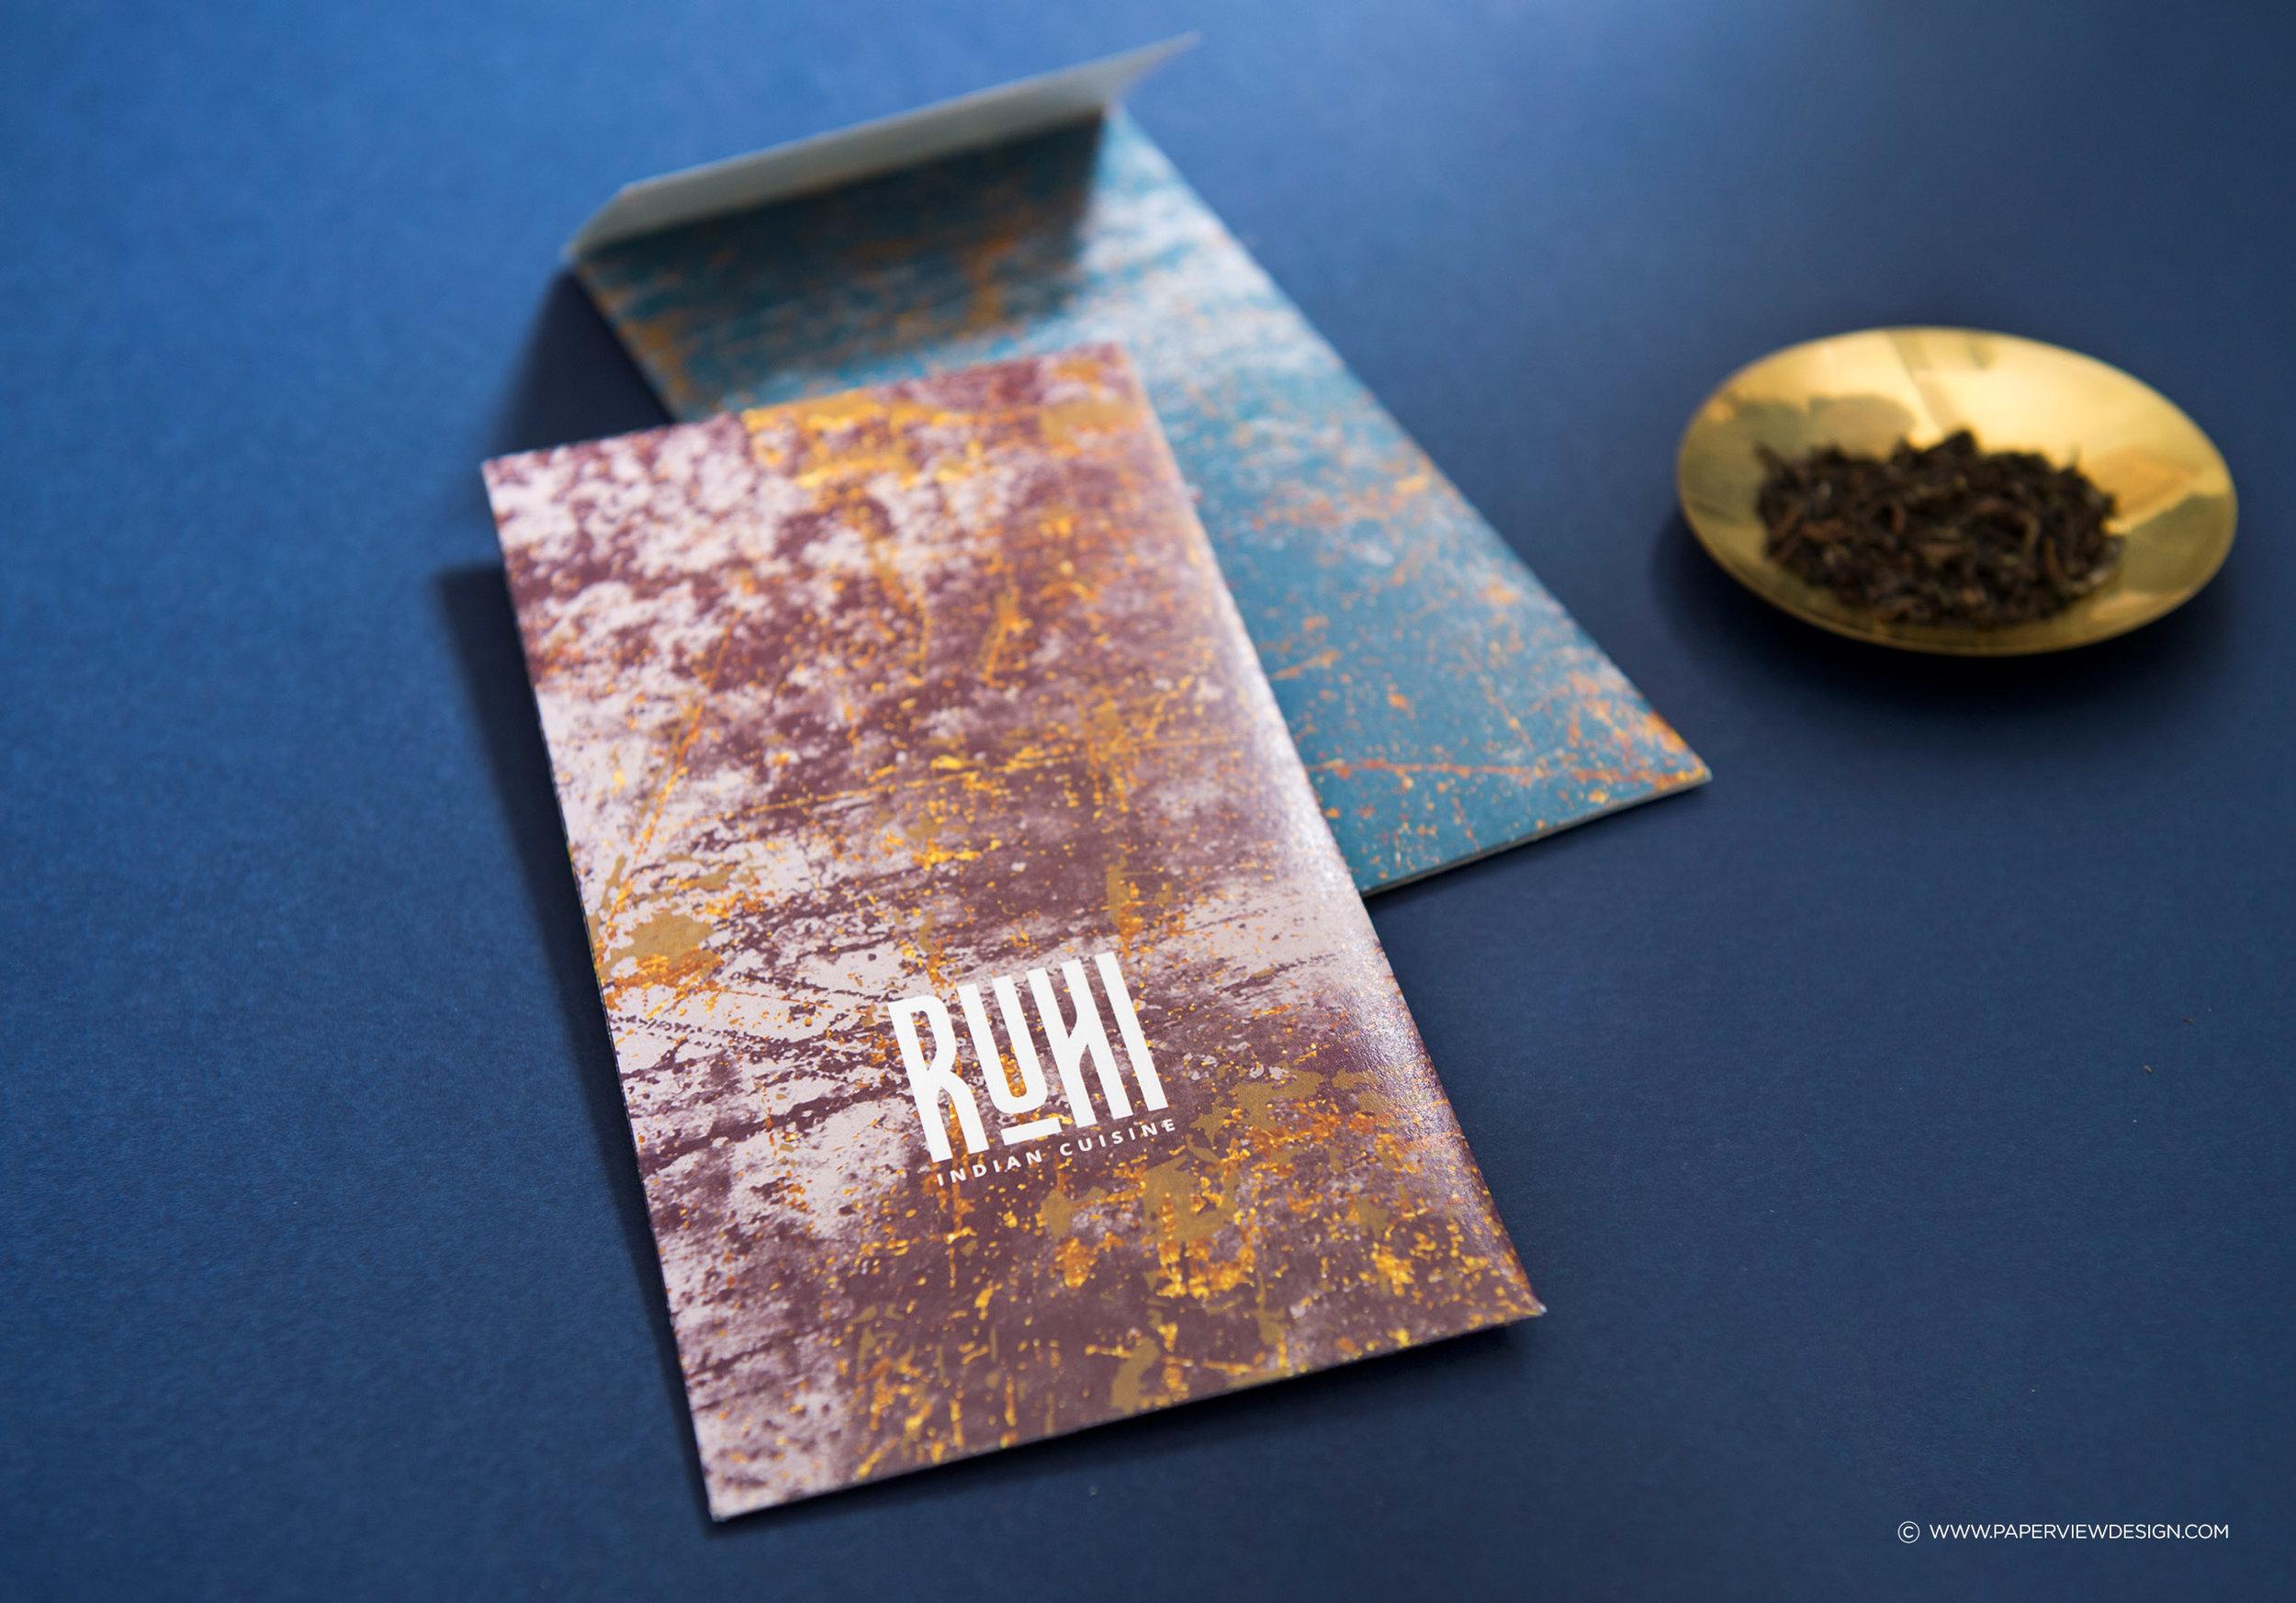 Ruhi-KSA-Indian-Restaurant-Cuisine-Identity-Branding-Cutlery-Pack